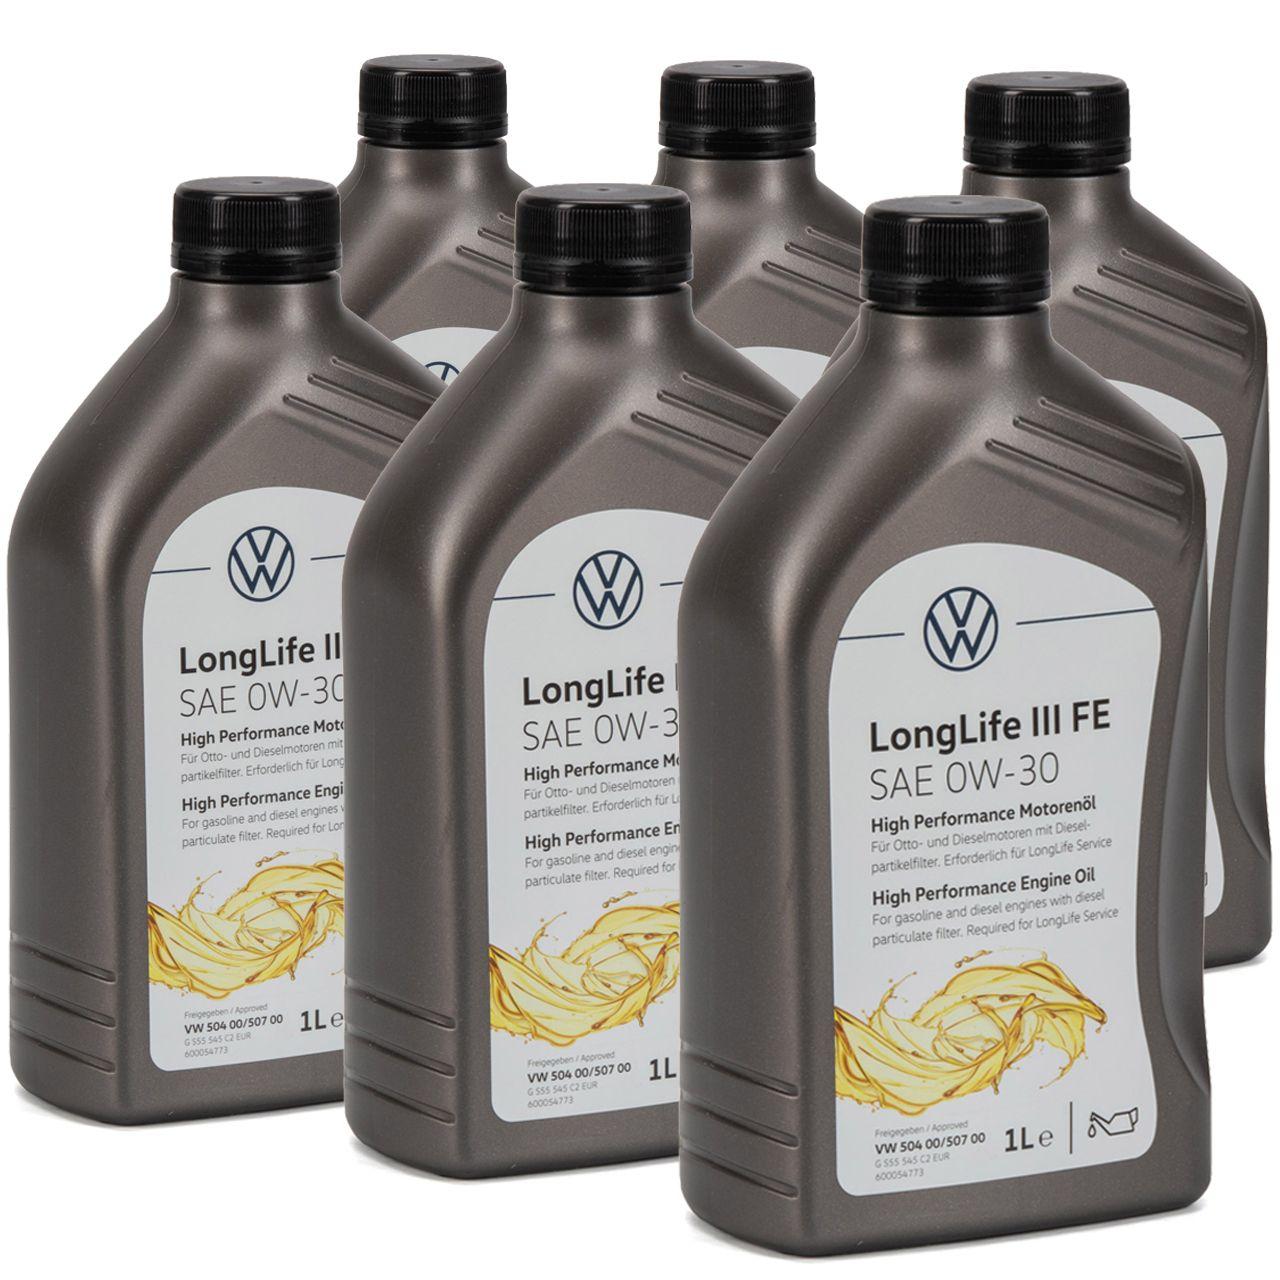 ORIGINAL VW Motoröl Öl 0W-30 LONGLIFE III FE 504.00 507.00 GS55545C2 - 6 Liter